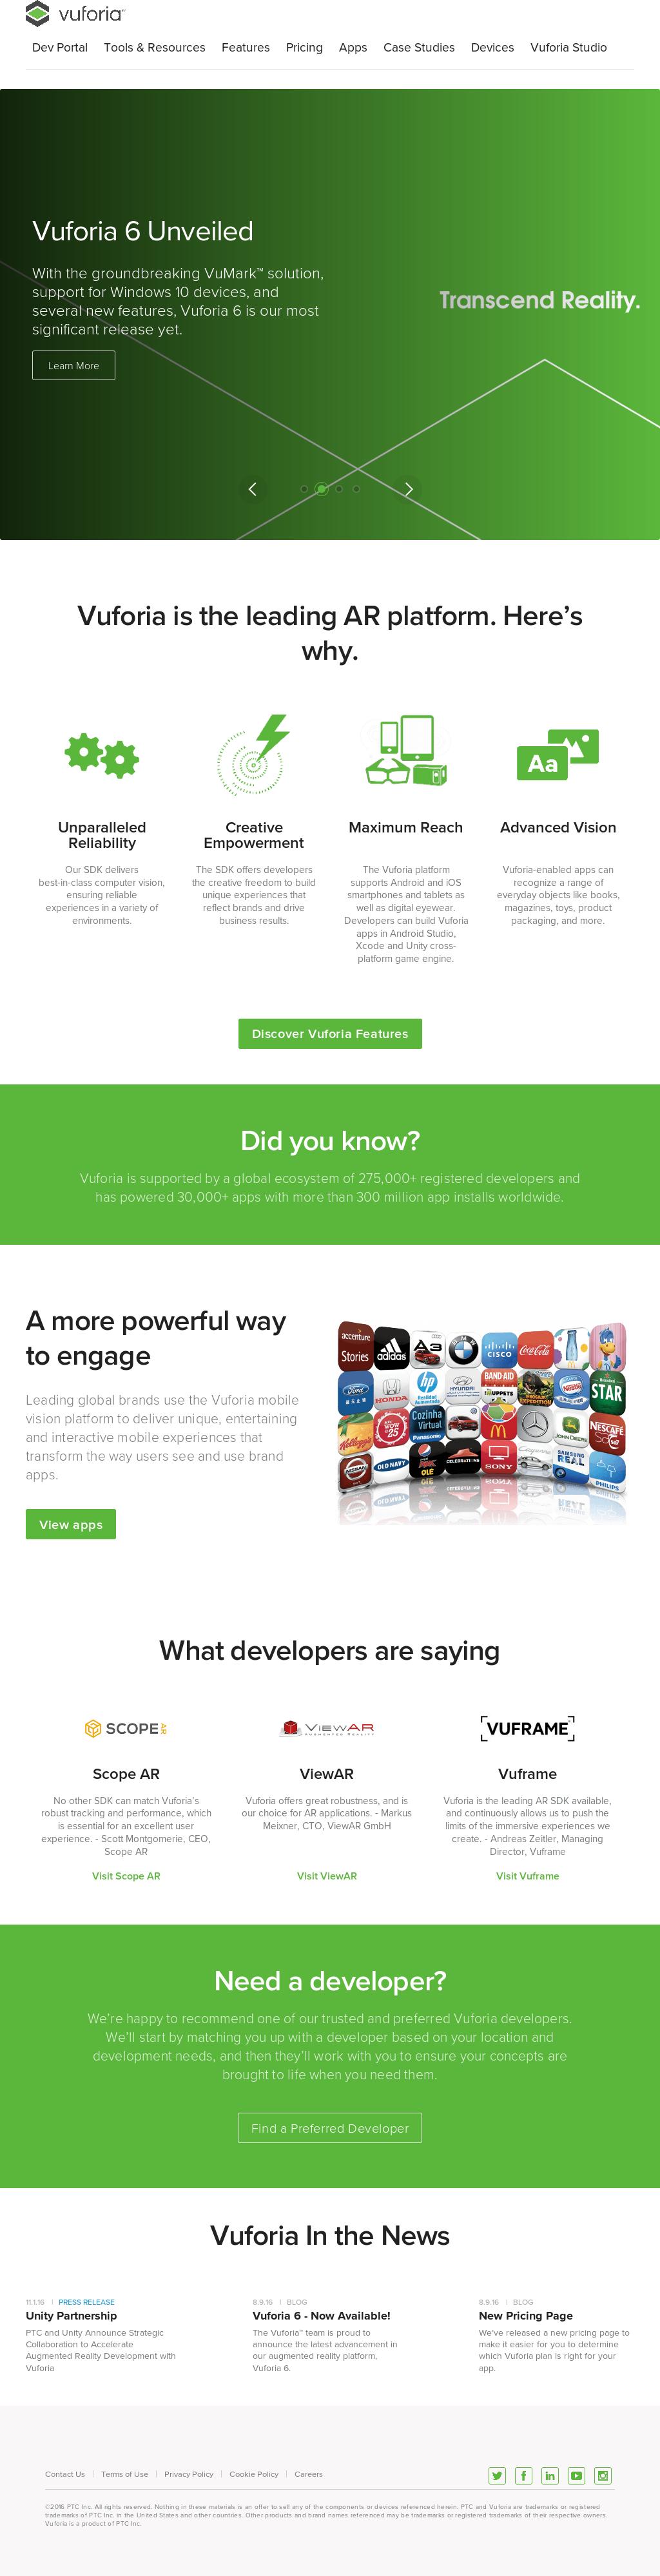 Vuforia Competitors, Revenue and Employees - Owler Company